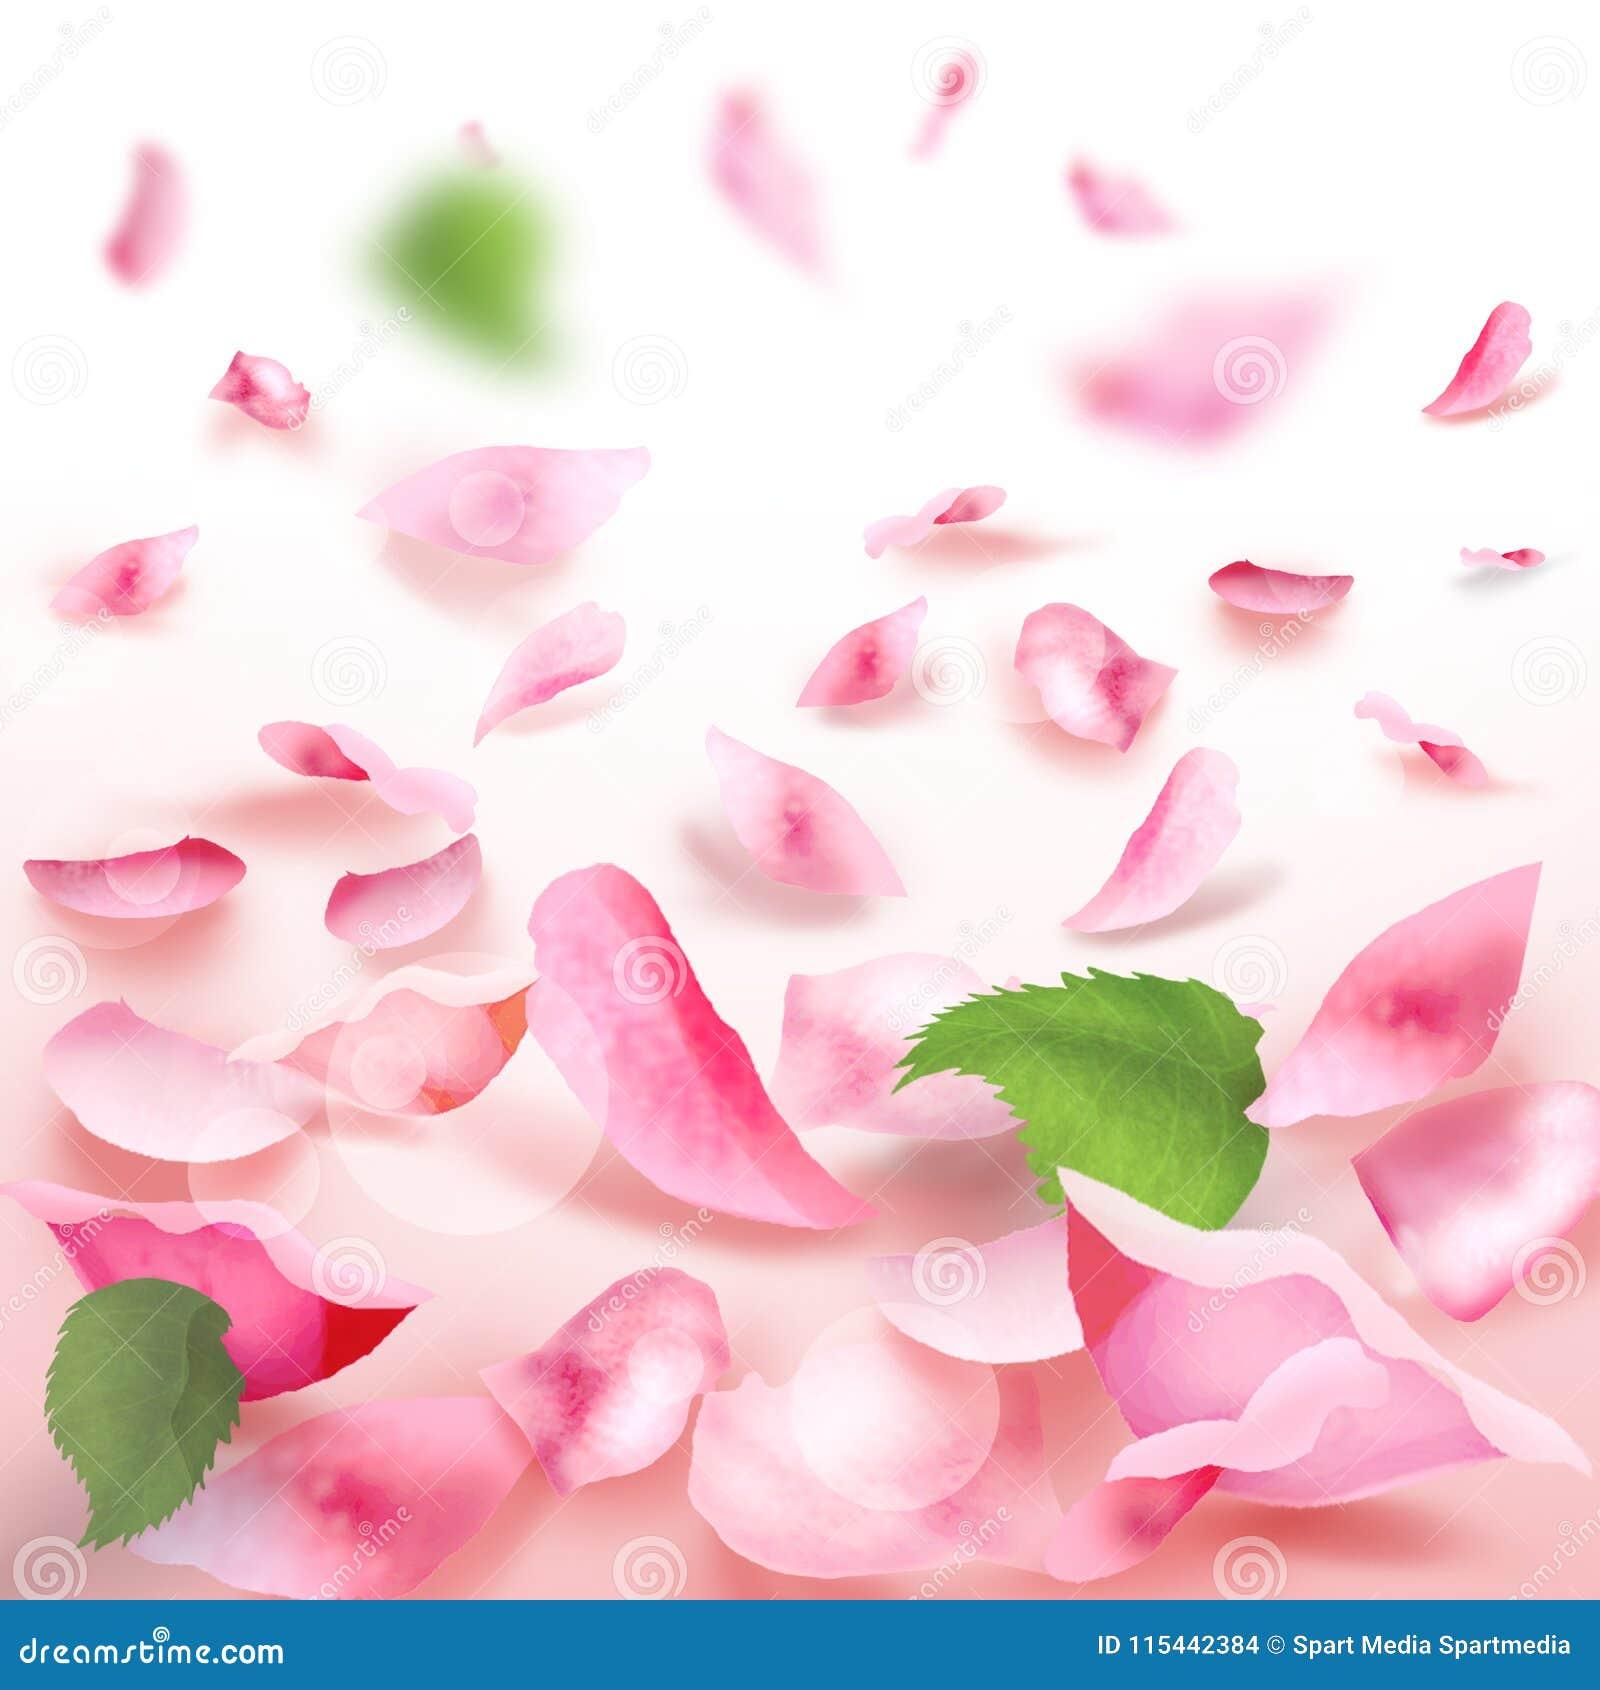 Rose petals falling romance blank frame